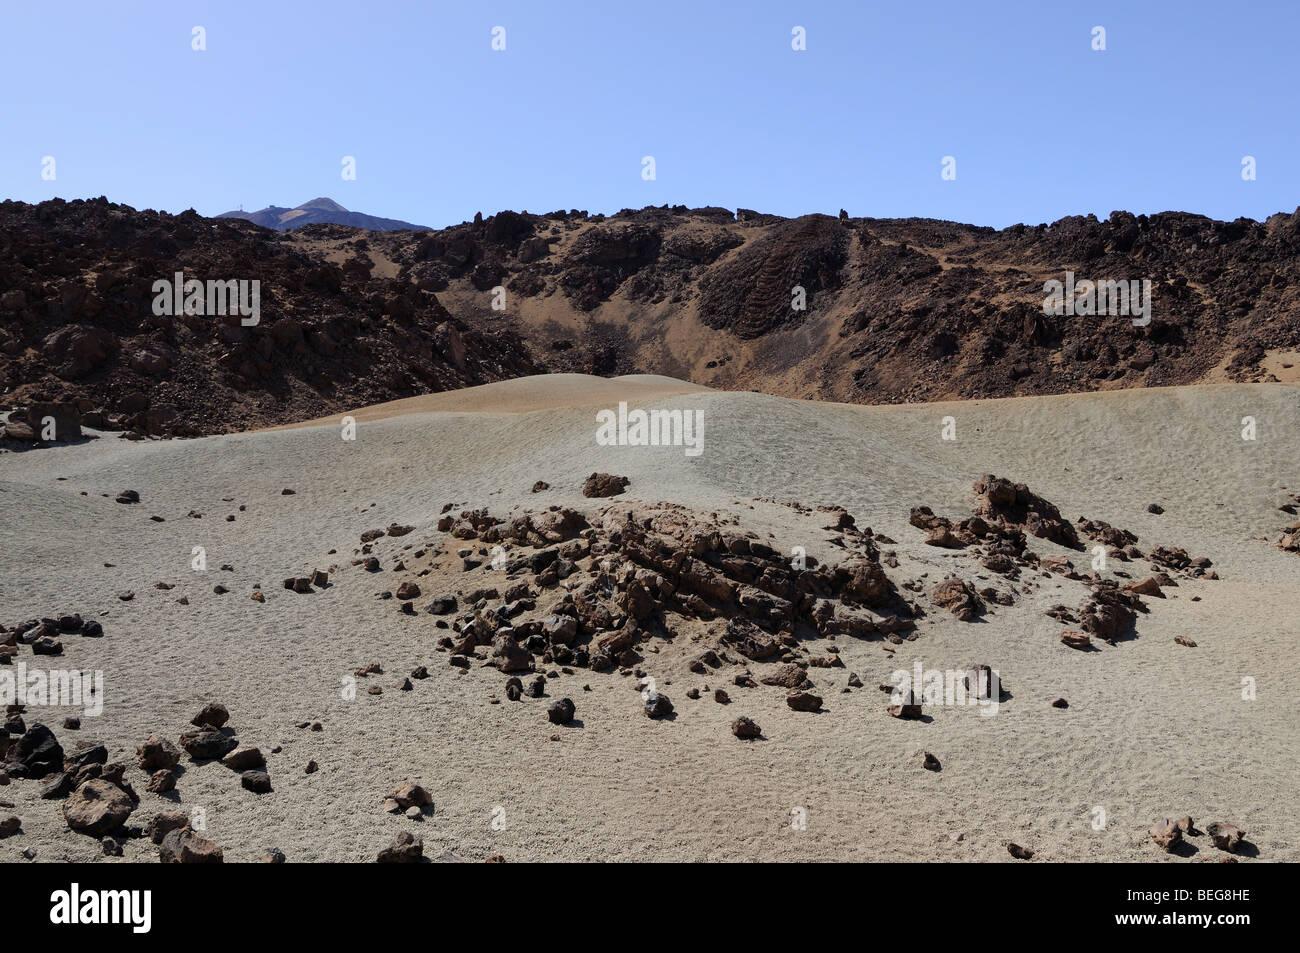 Volcanic Landscape in Teide National Park, Tenerife Spain - Stock Image